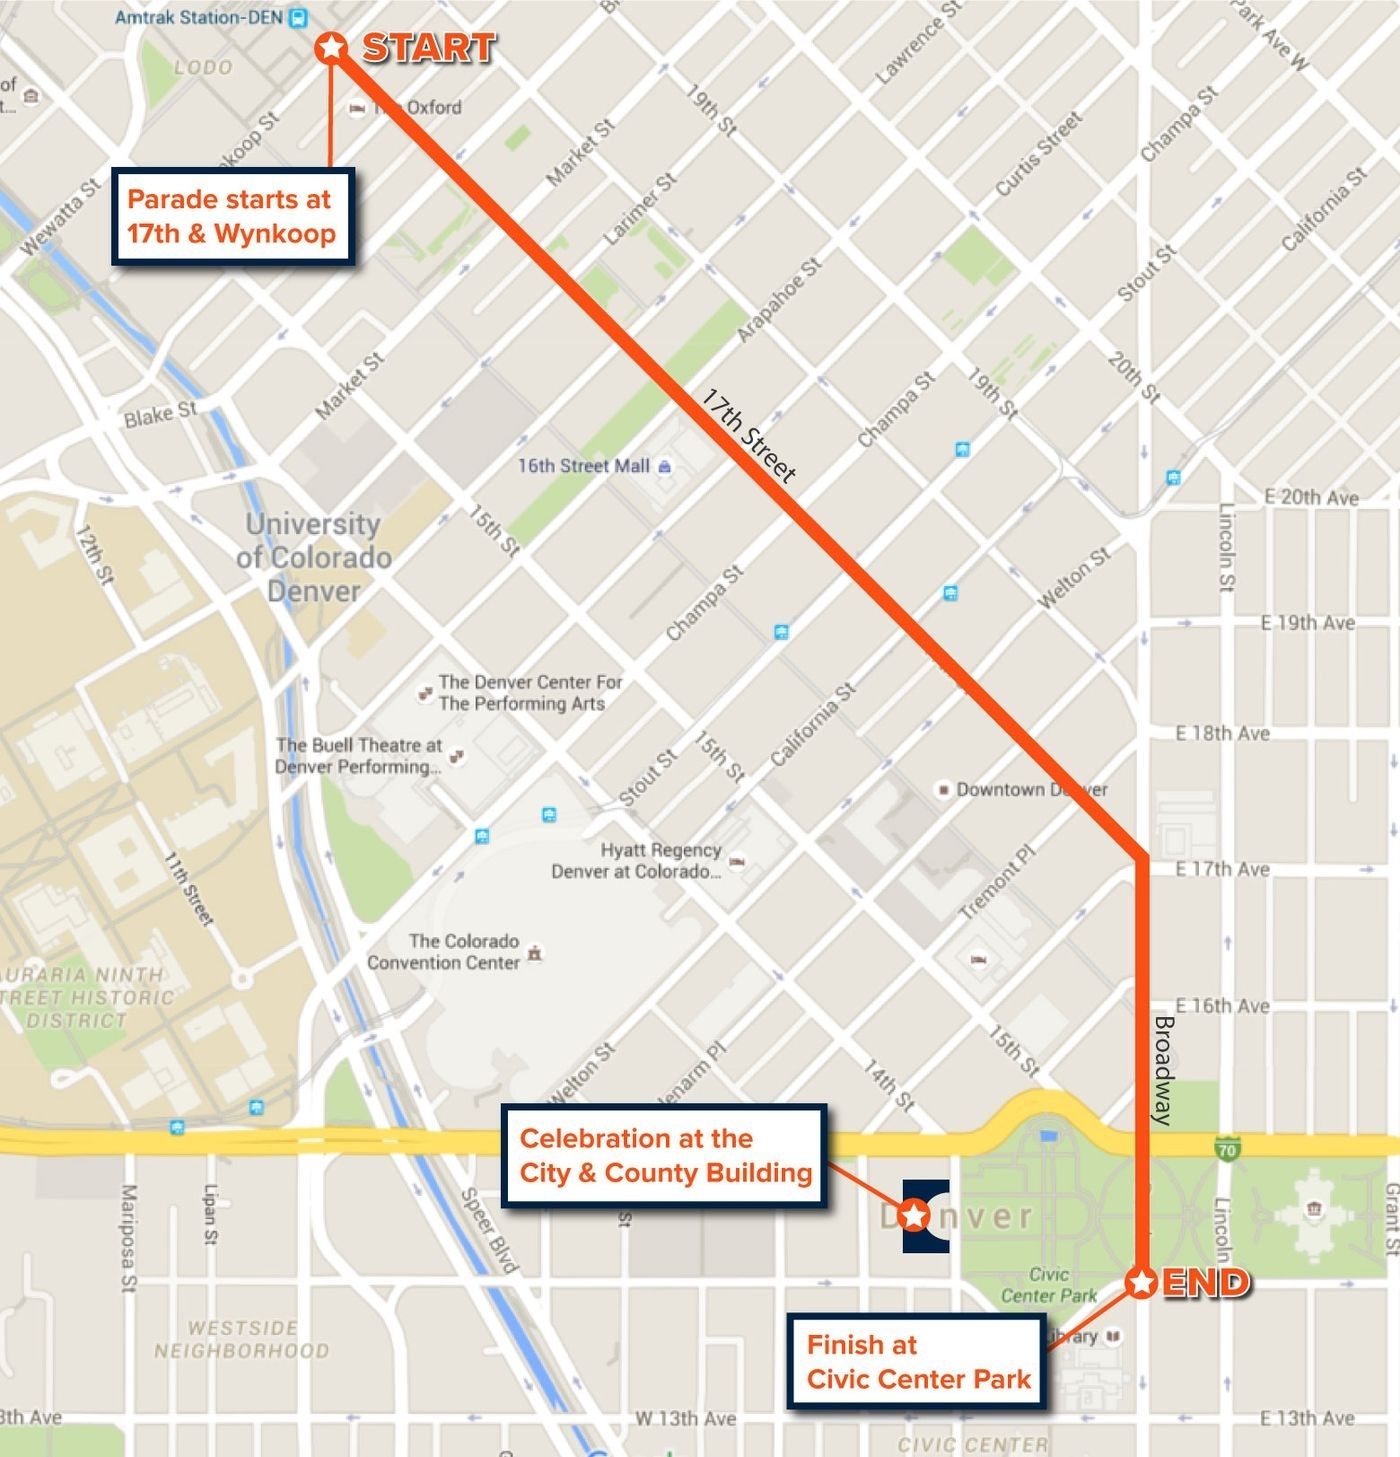 Super Bowl Parade 2016 Map And Route For Denver Broncos within Super Bowl Parade 2019 Map